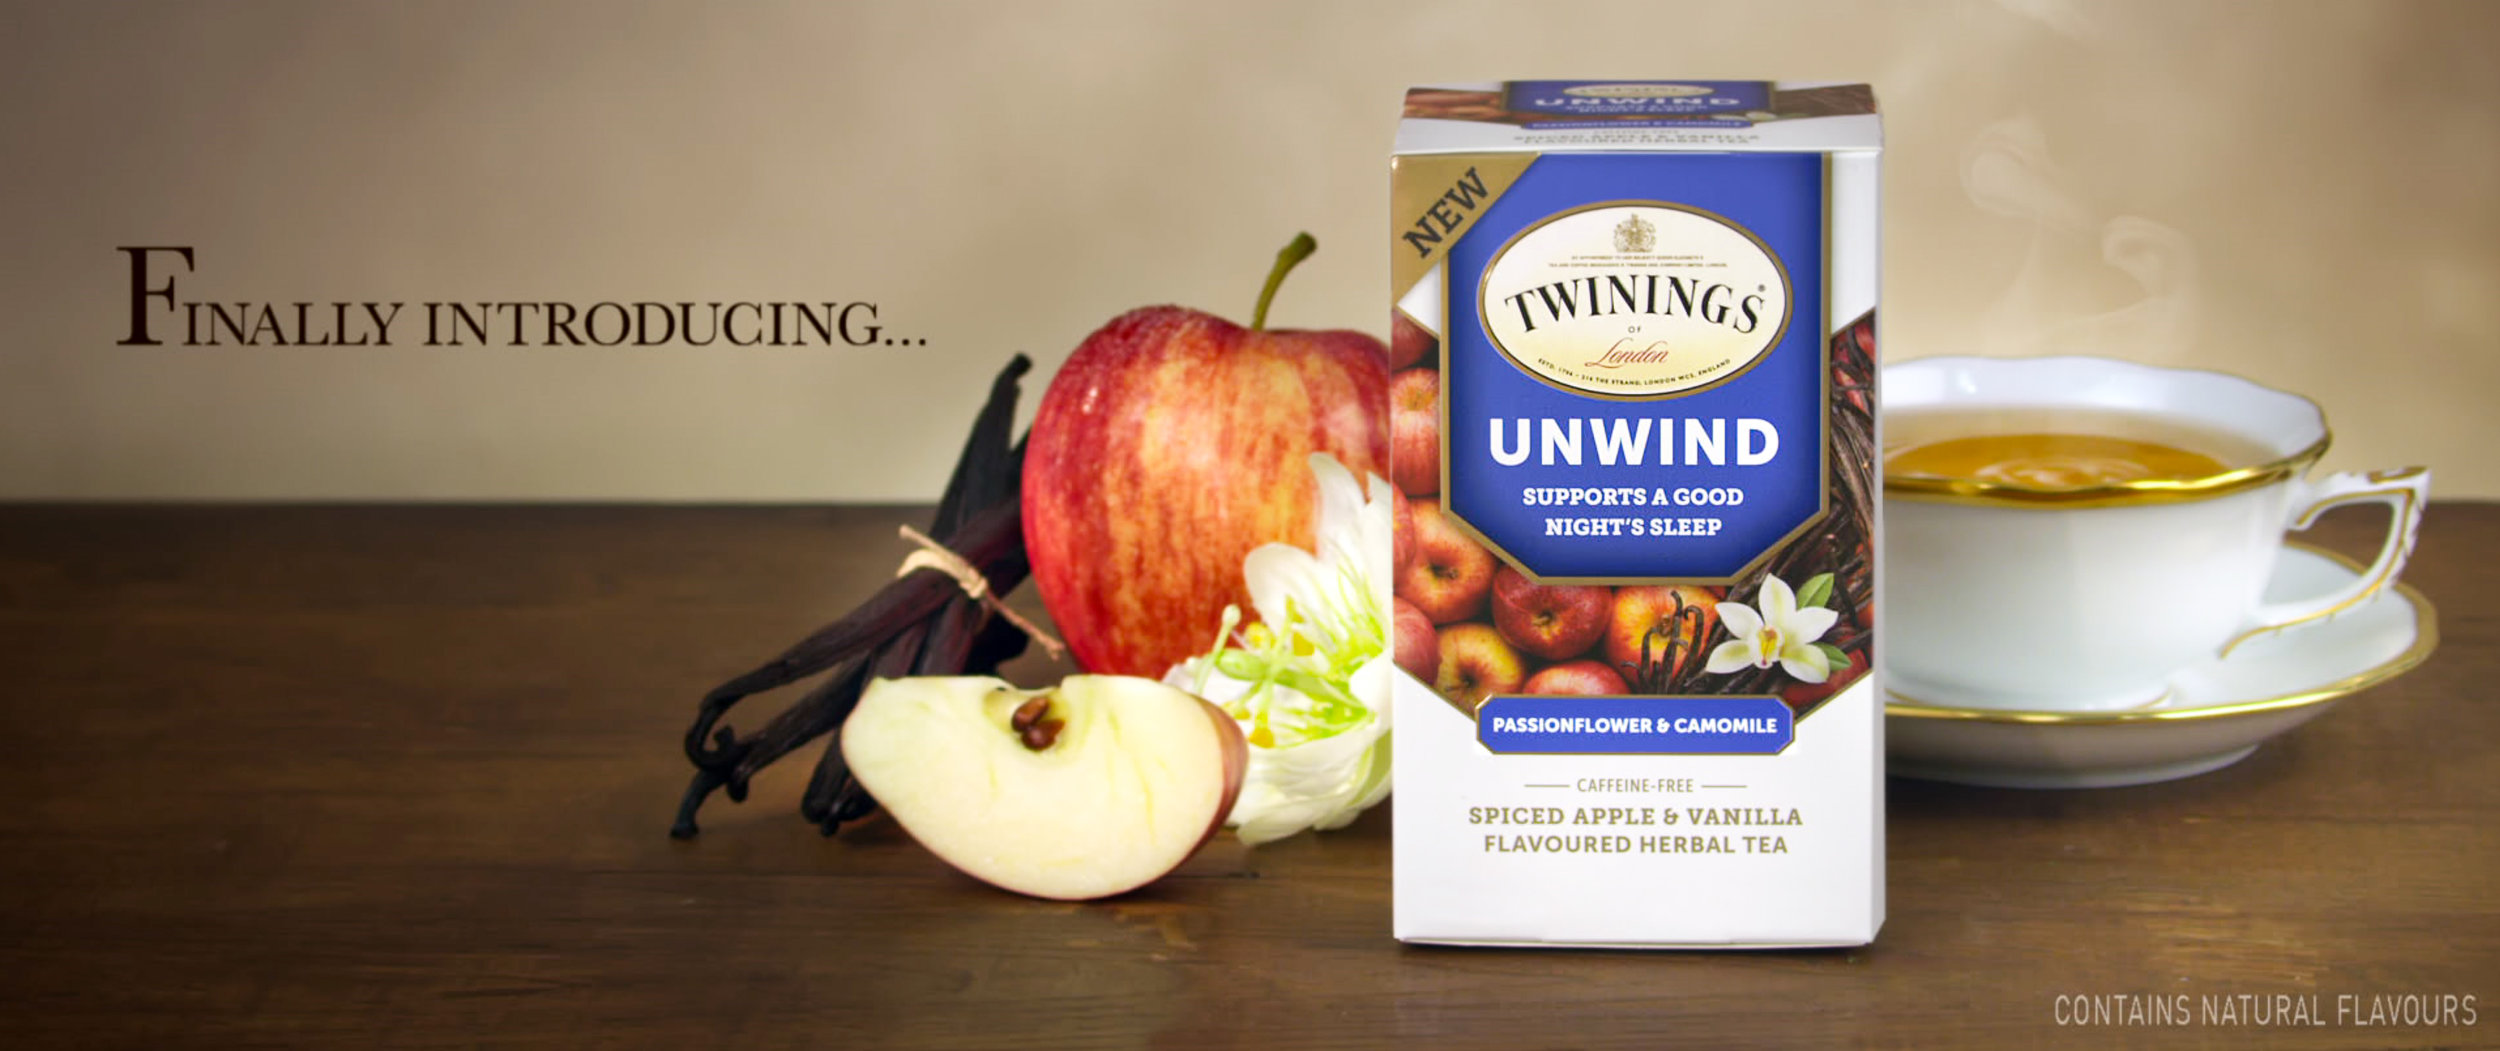 Twinings-4.jpg